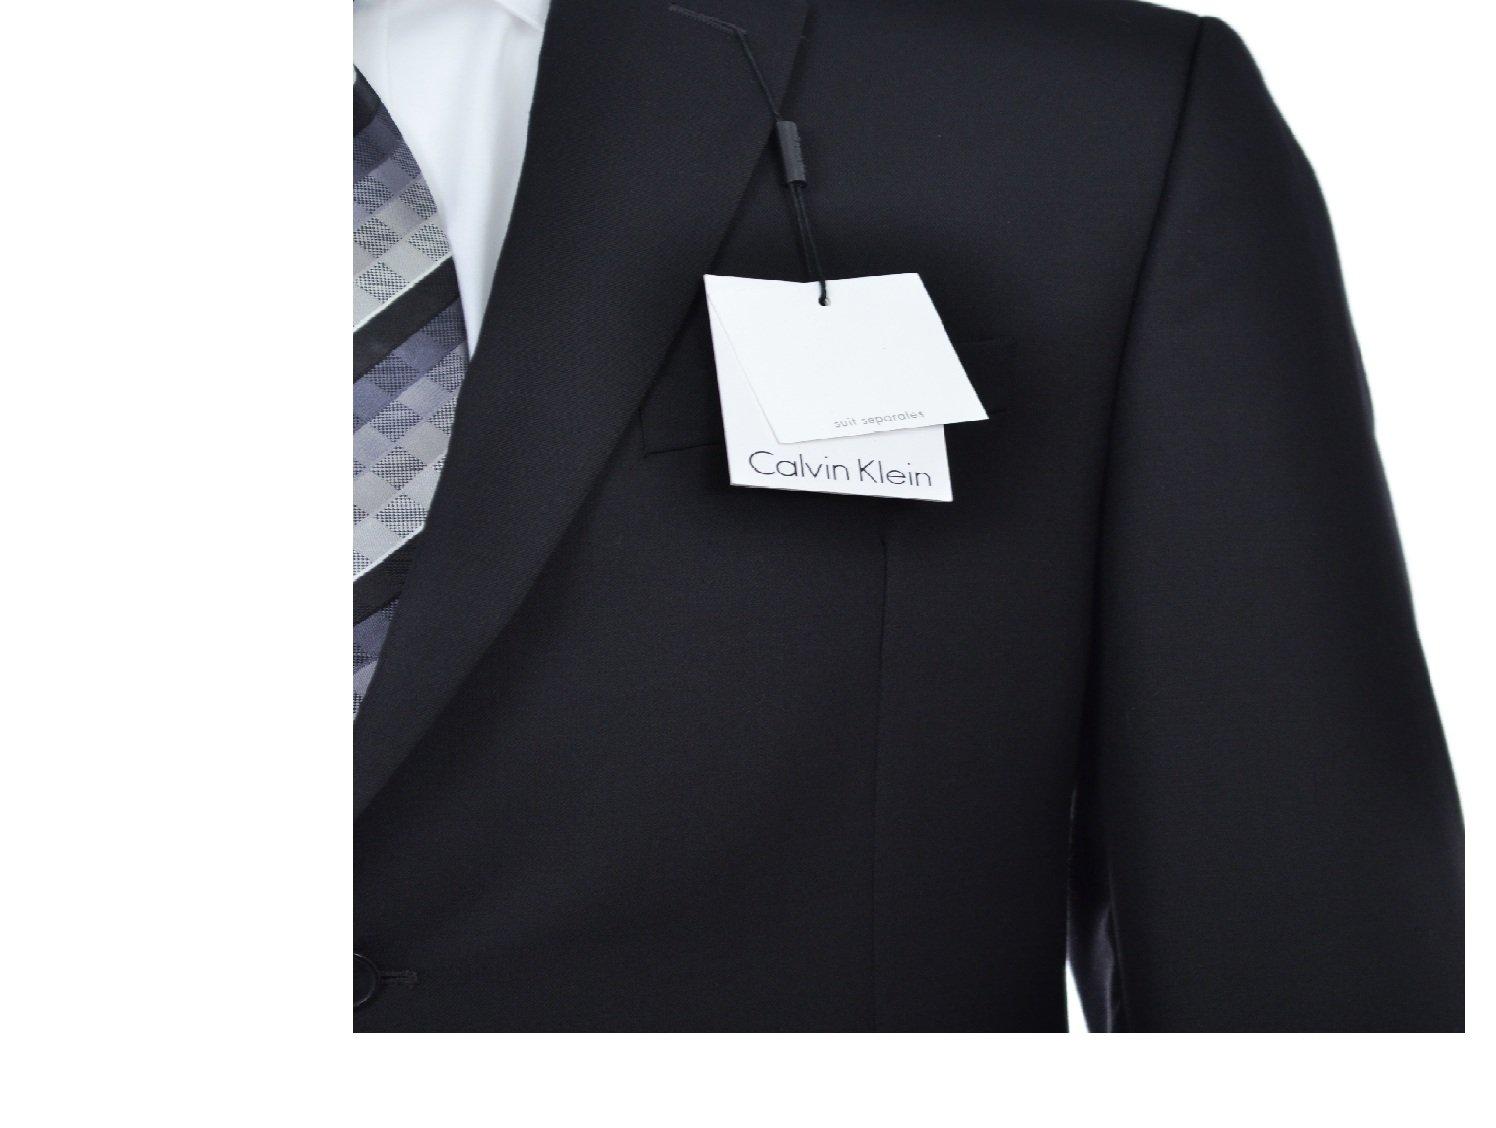 Calvin Klein Slim Fit Black Solid Two Button Wool New Men's Suit Set (44R 40W x 32L) by Calvin ` Klein (Image #4)